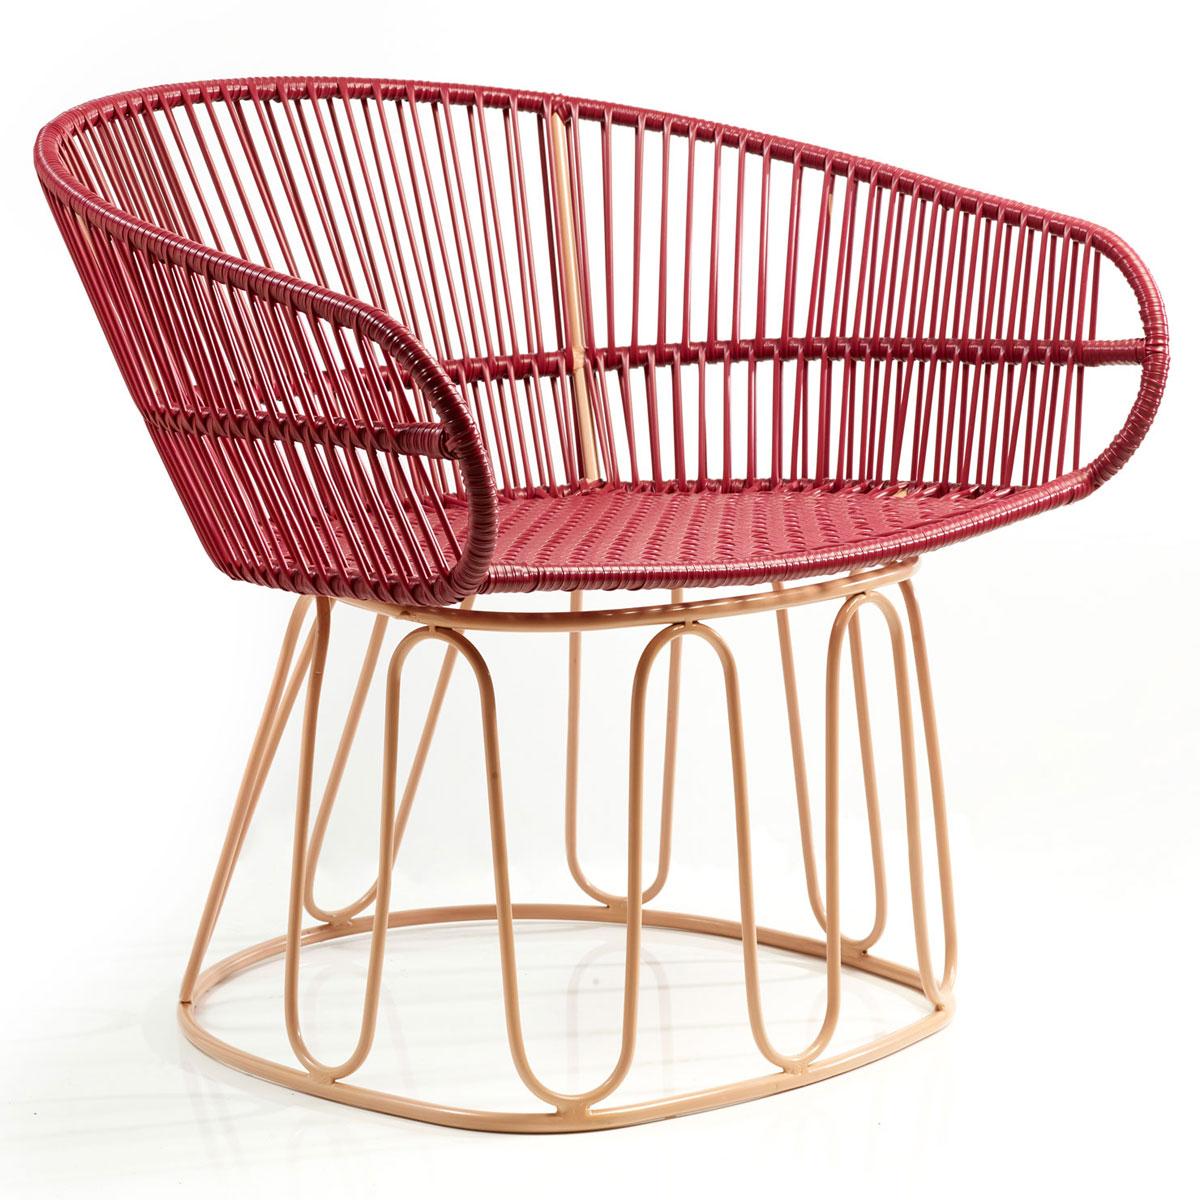 AMES CIRCO | Lounge Stuhl – purpur, carne